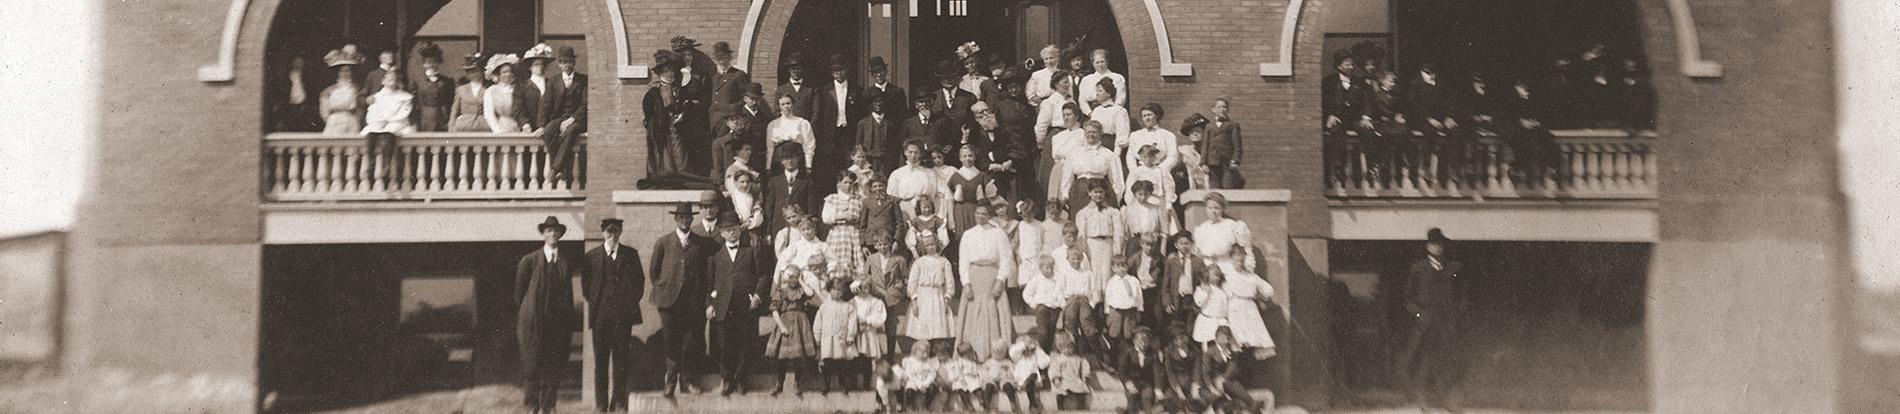 Baptist Children's Home early 1900s